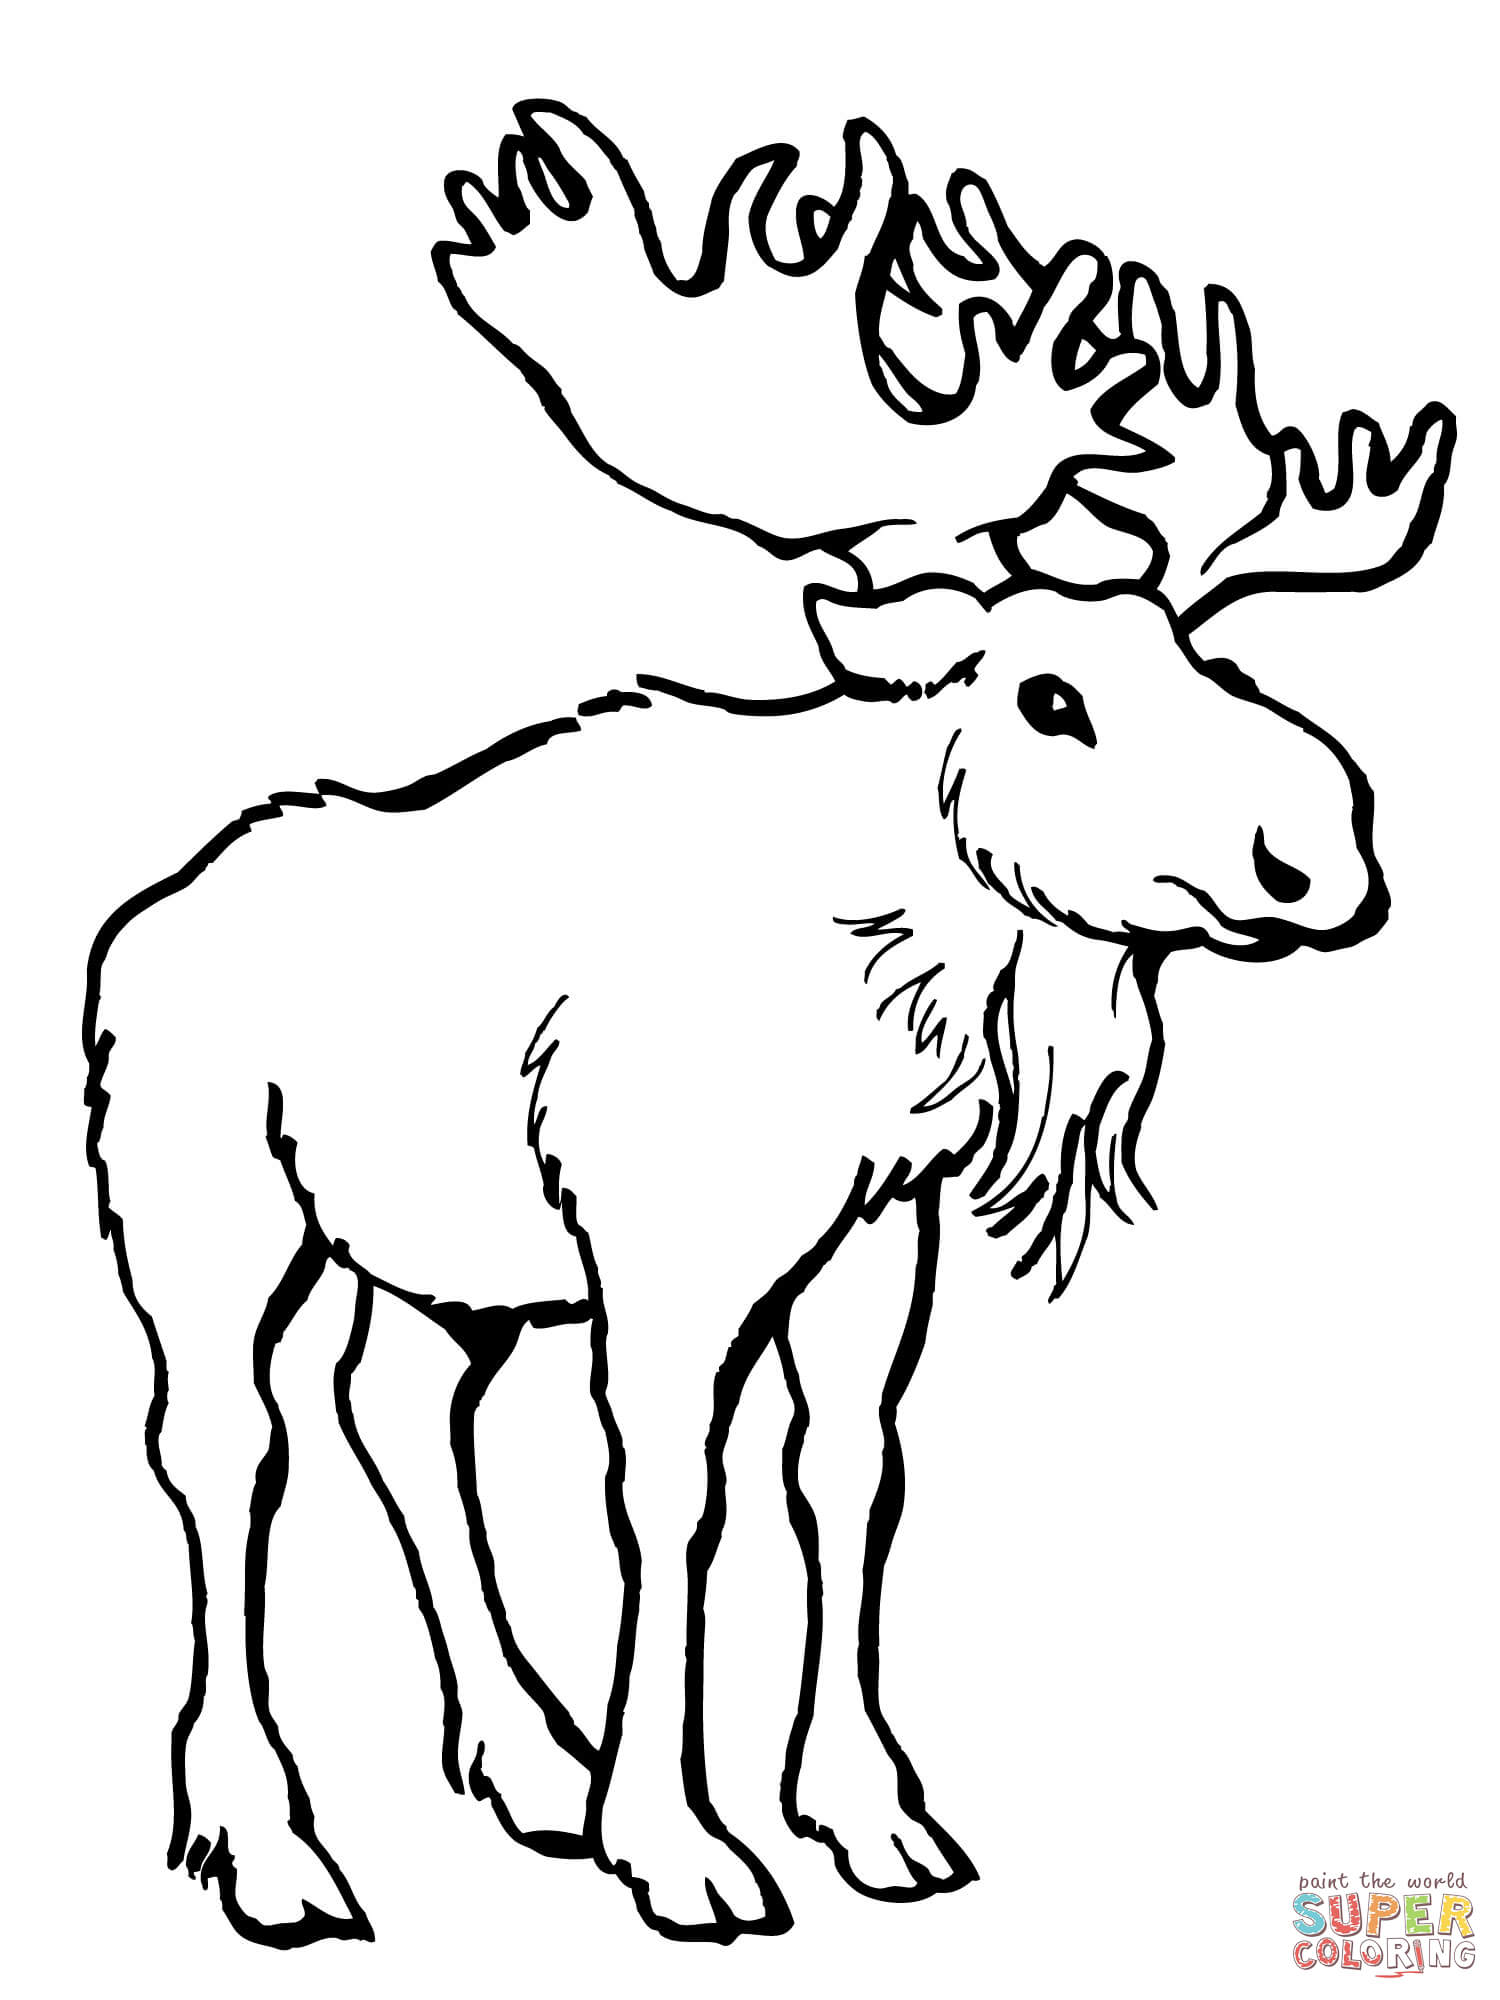 Alaska clipart moose alaska. Deer coloring page free